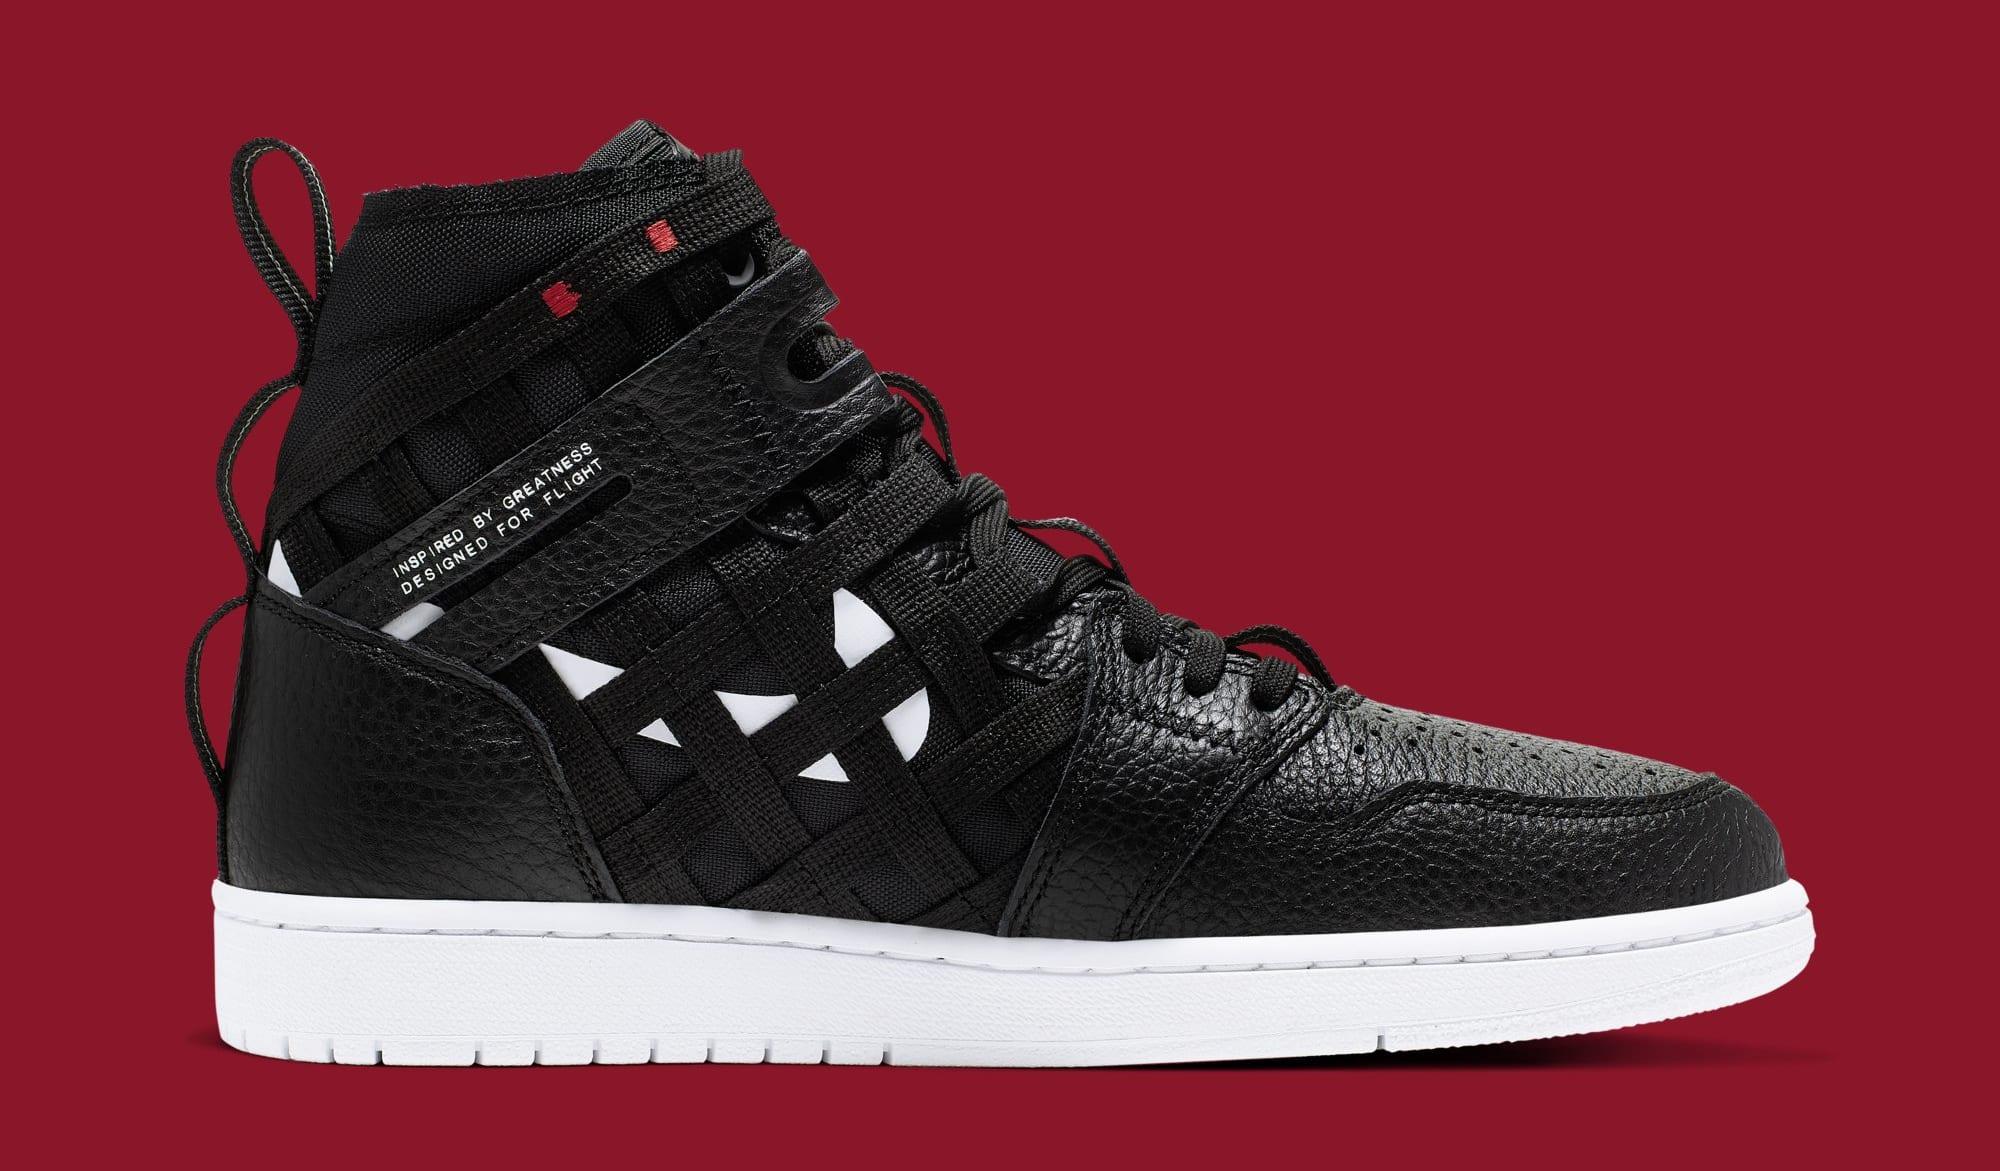 quality design d4ad8 bc1b3 Image via Nike WMNS Air Jordan 1 High Cargo  Black  CD6757-001 (Medial)